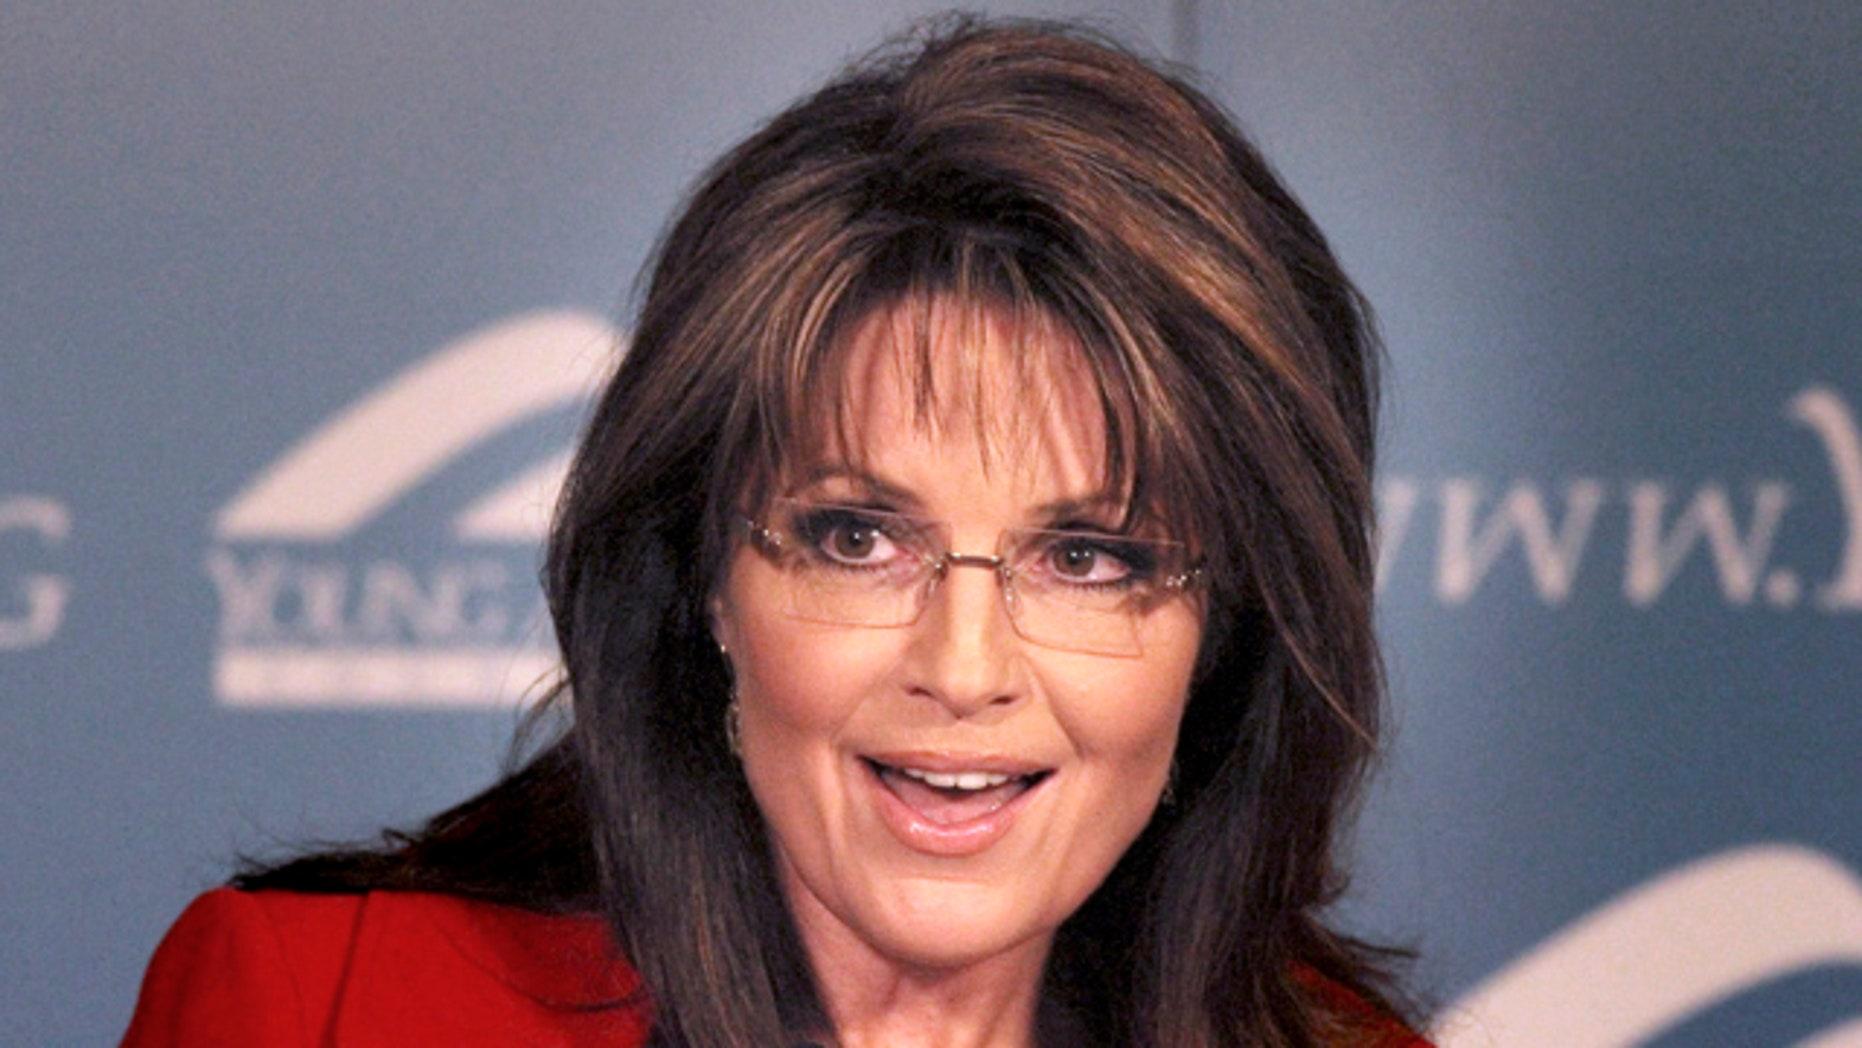 In this Feb. 4, 2011 file photo, former Republican vice presidential candidate and Alaskan Gov. Sarah Palin speaks at the Reagan Ranch Center in Santa Barbara, Calif.